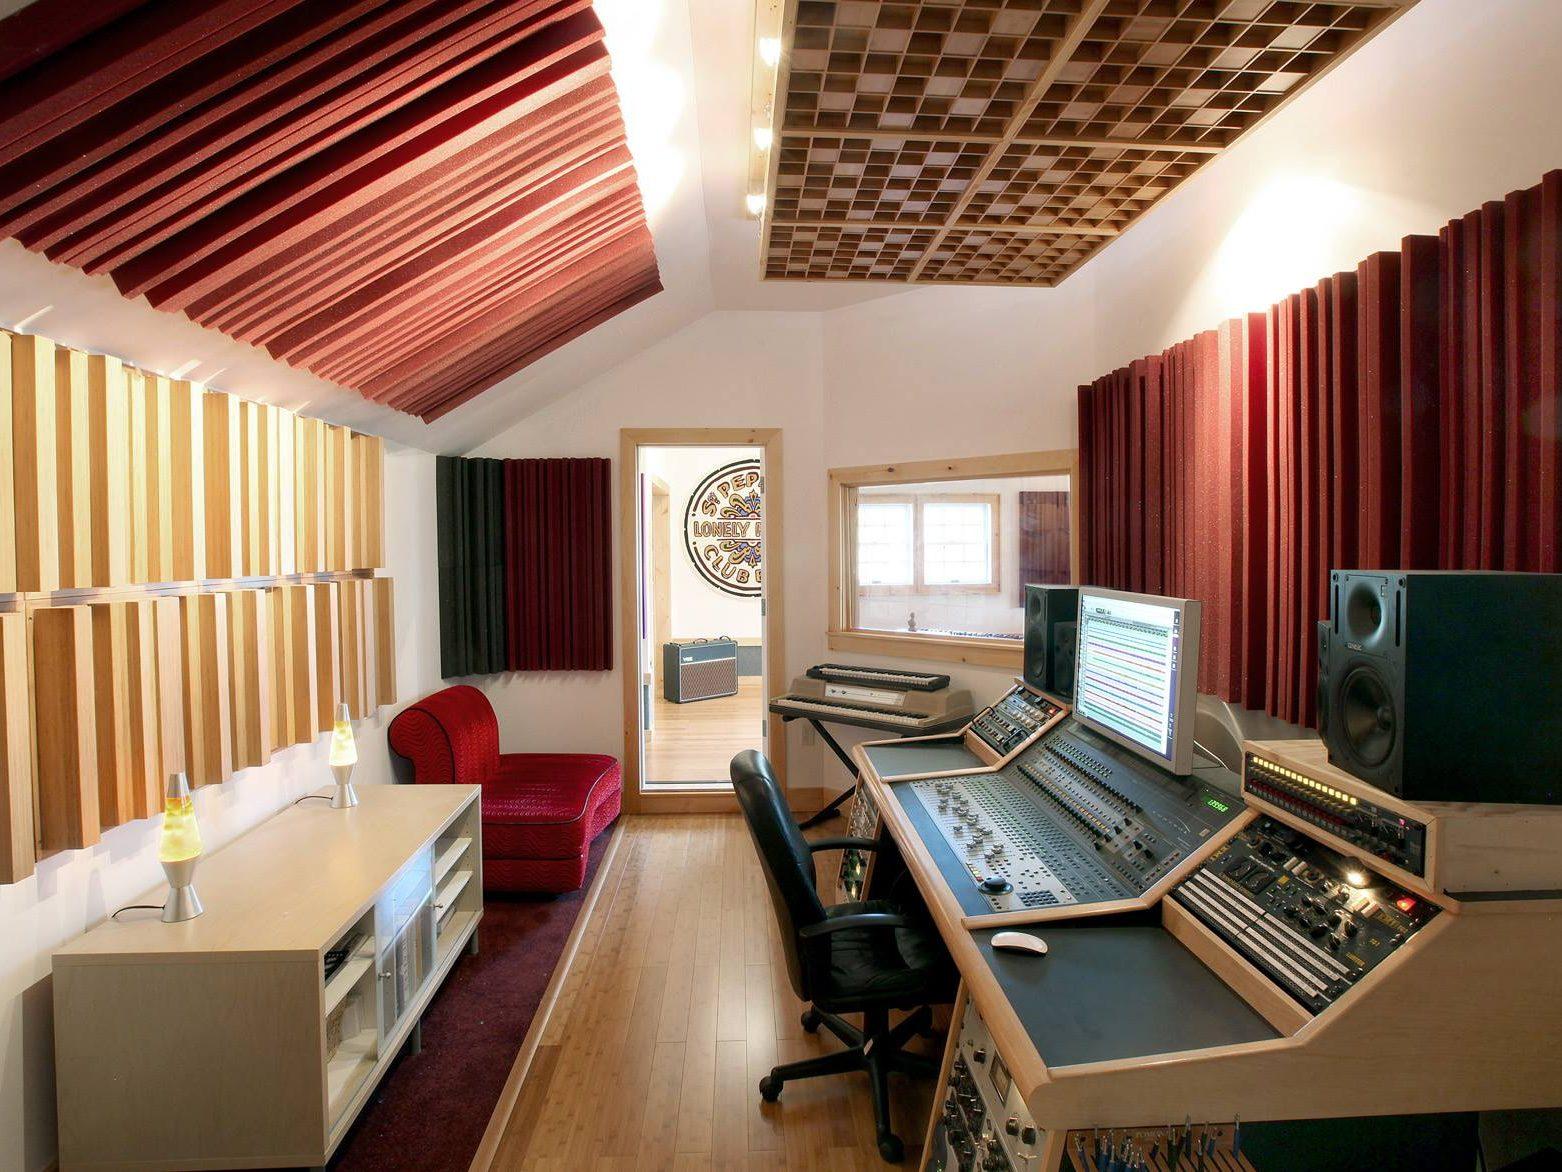 Studiofoam Metro 5 cm , Studiofoam Metro 10 cm , Bass Traps LENRD, Consolle Buso Audio, Auralex Wave Prism